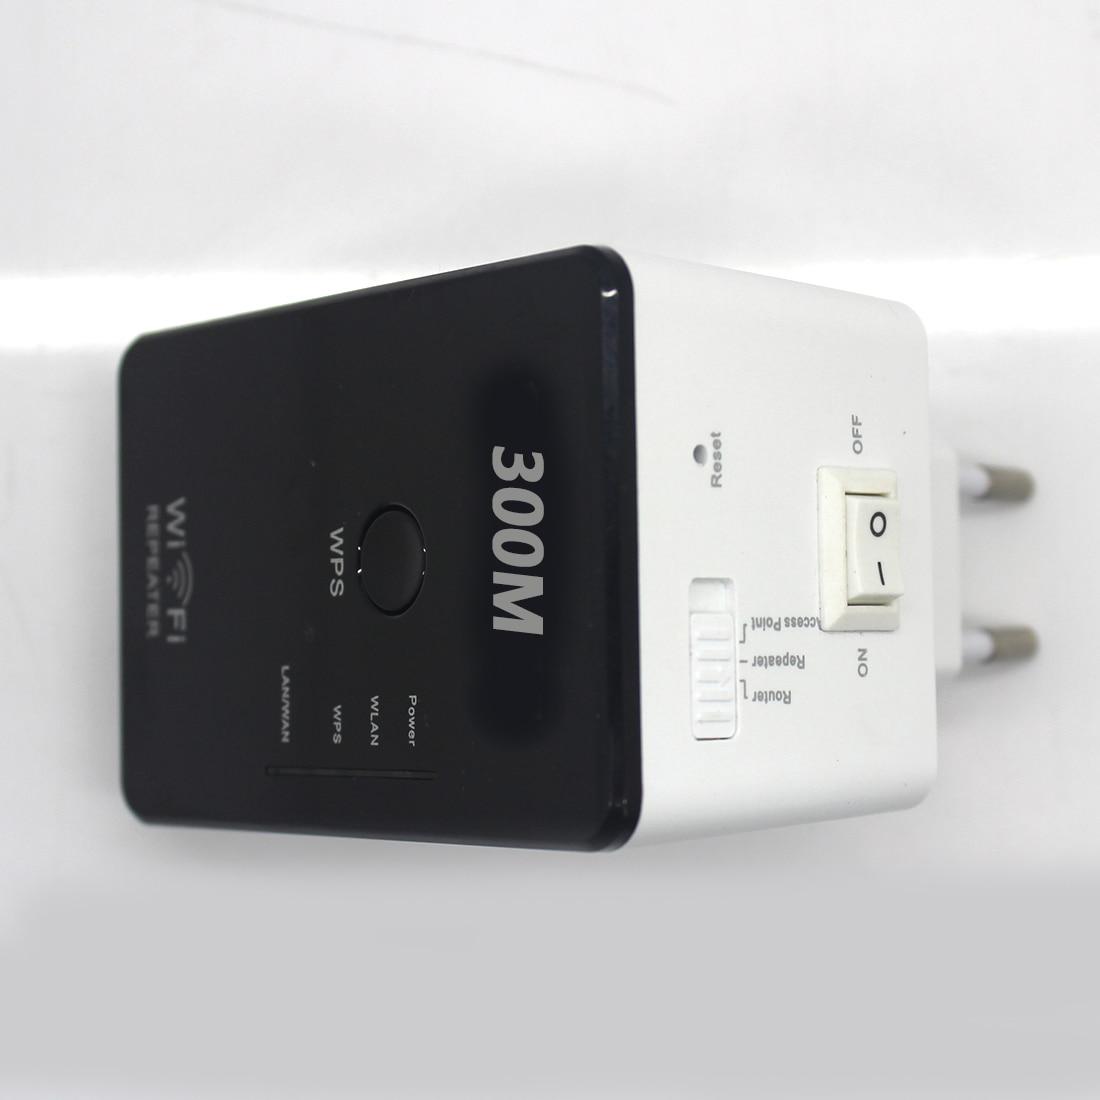 NOYOKERE New High Quality 802.11N Wifi Repeater Wireless-N AP Range Extender 300Mbps Booster Signal Amplifier wlan EU